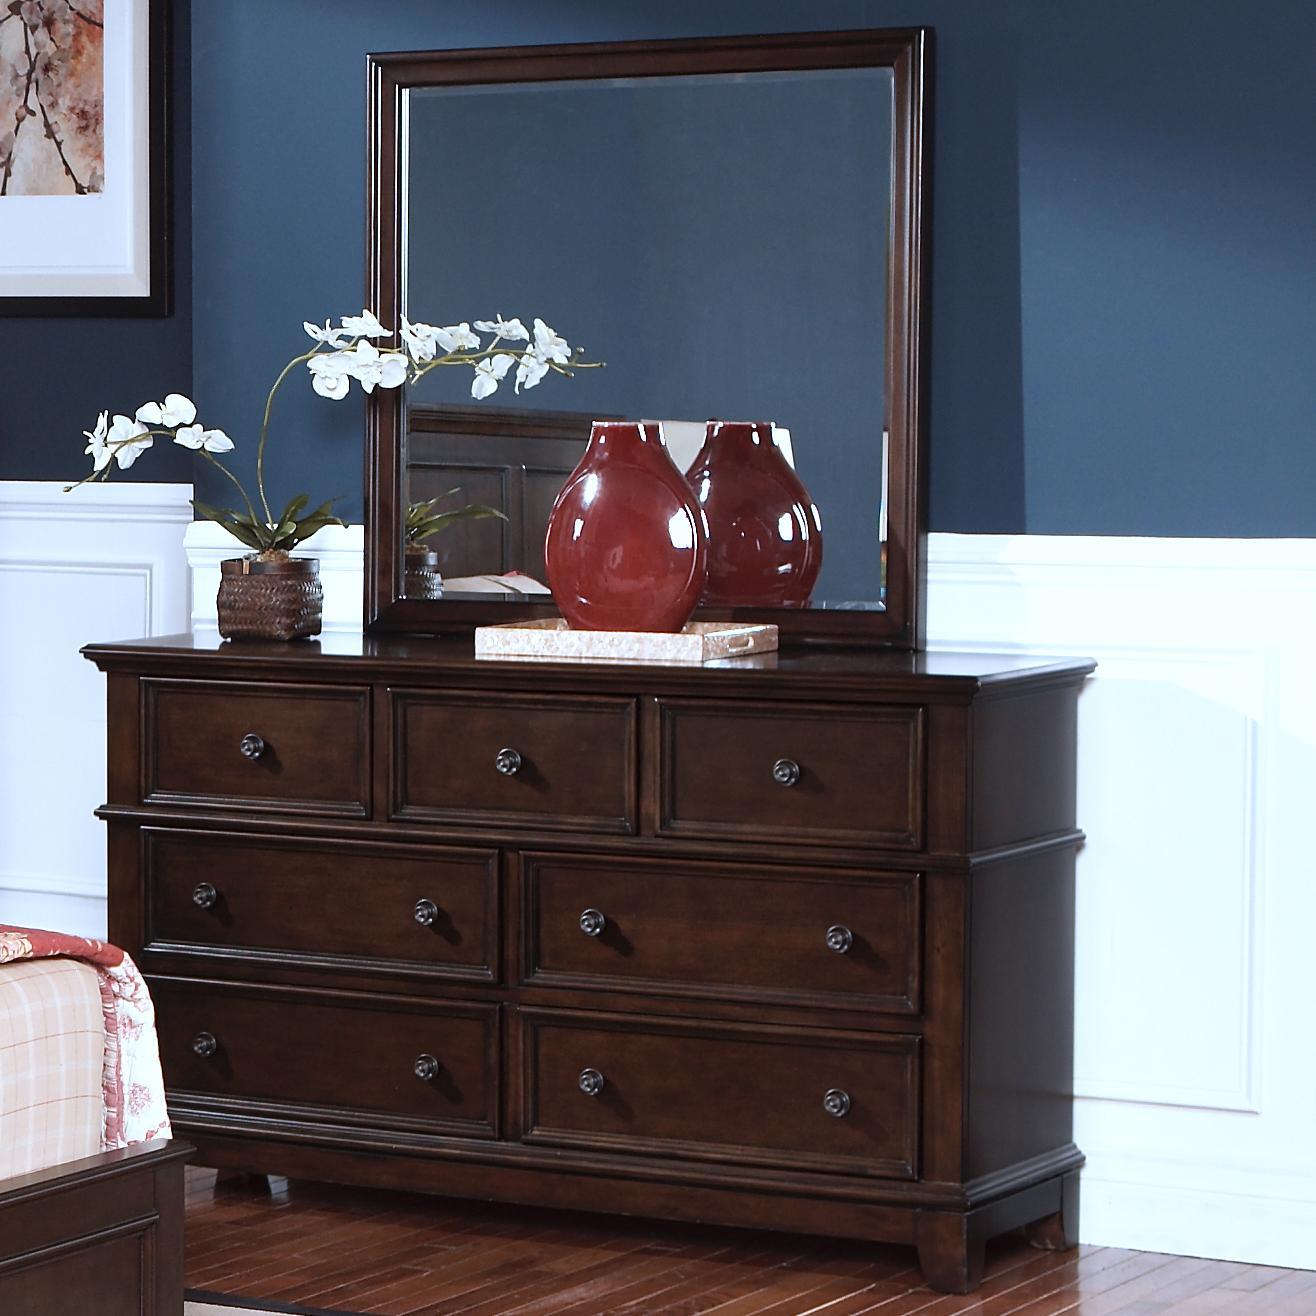 New Classic Prescott Dresser and Mirror - Item Number: 00-181-050+060